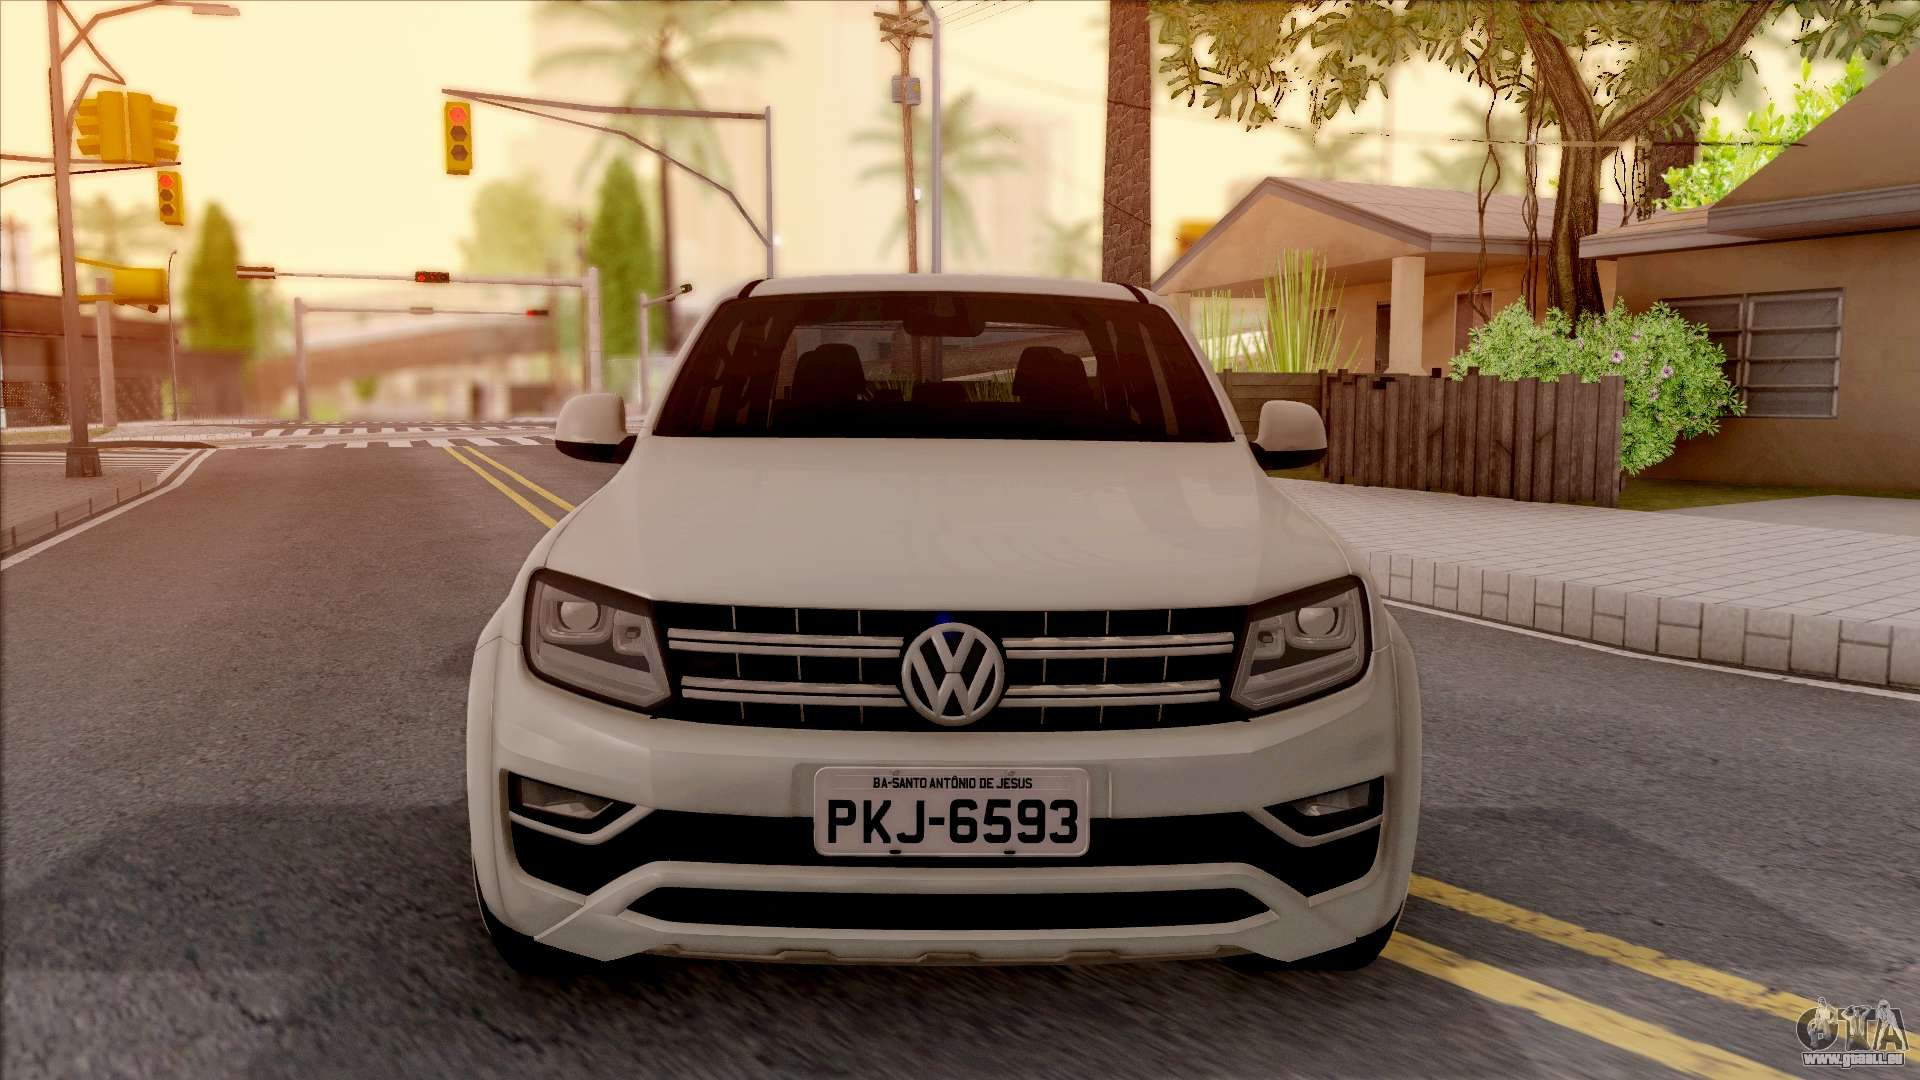 volkswagen amarok 4motion 2017 pour gta san andreas. Black Bedroom Furniture Sets. Home Design Ideas